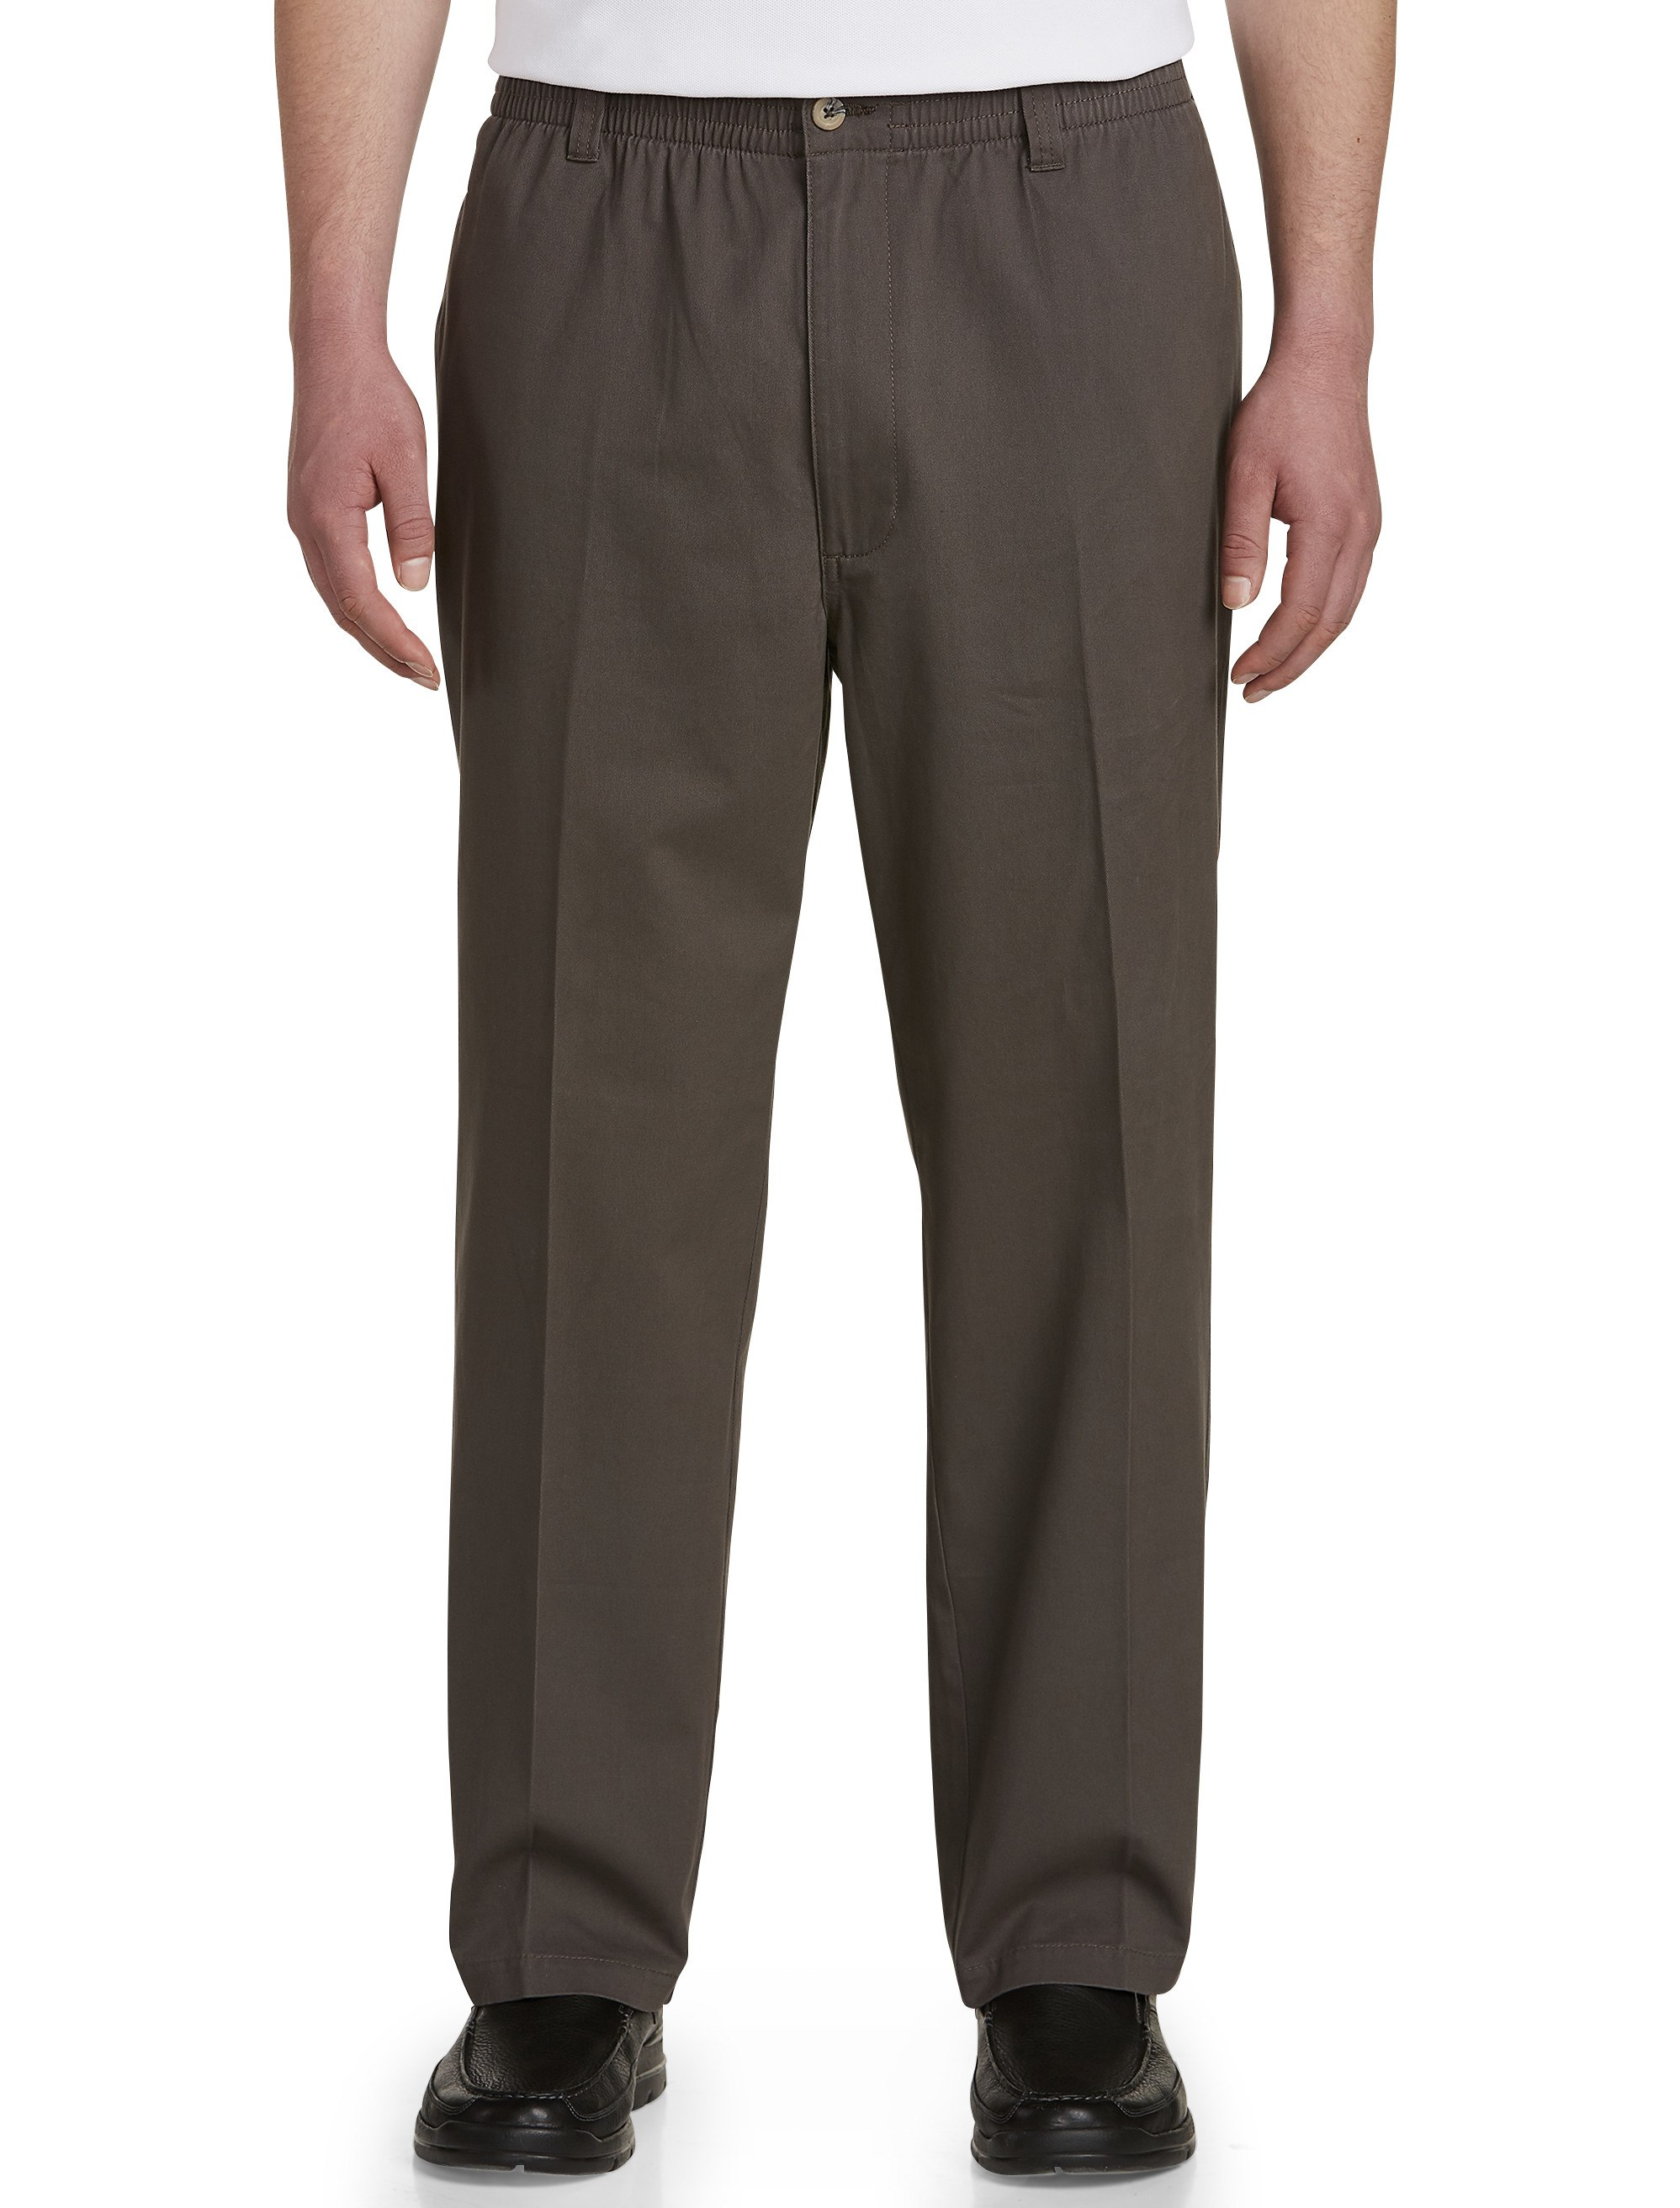 Men's Big & Tall Harbor Bay Elastic-Waist Twill Pants – Unhemmed